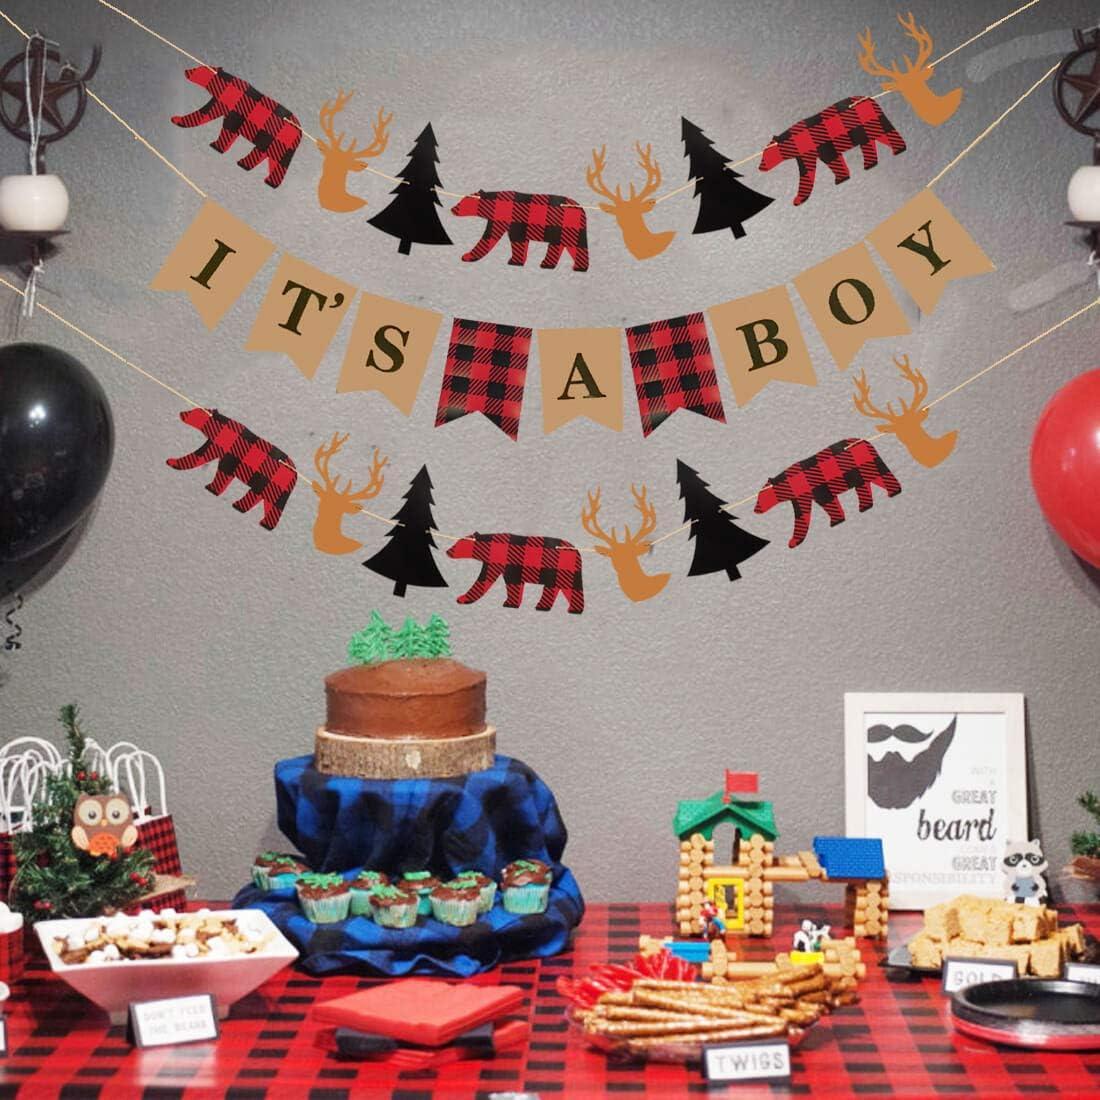 Details about  /Uniwish Buffalo Plaid Banner Lumberjack Theme Baby Shower Birthday Party Decorat